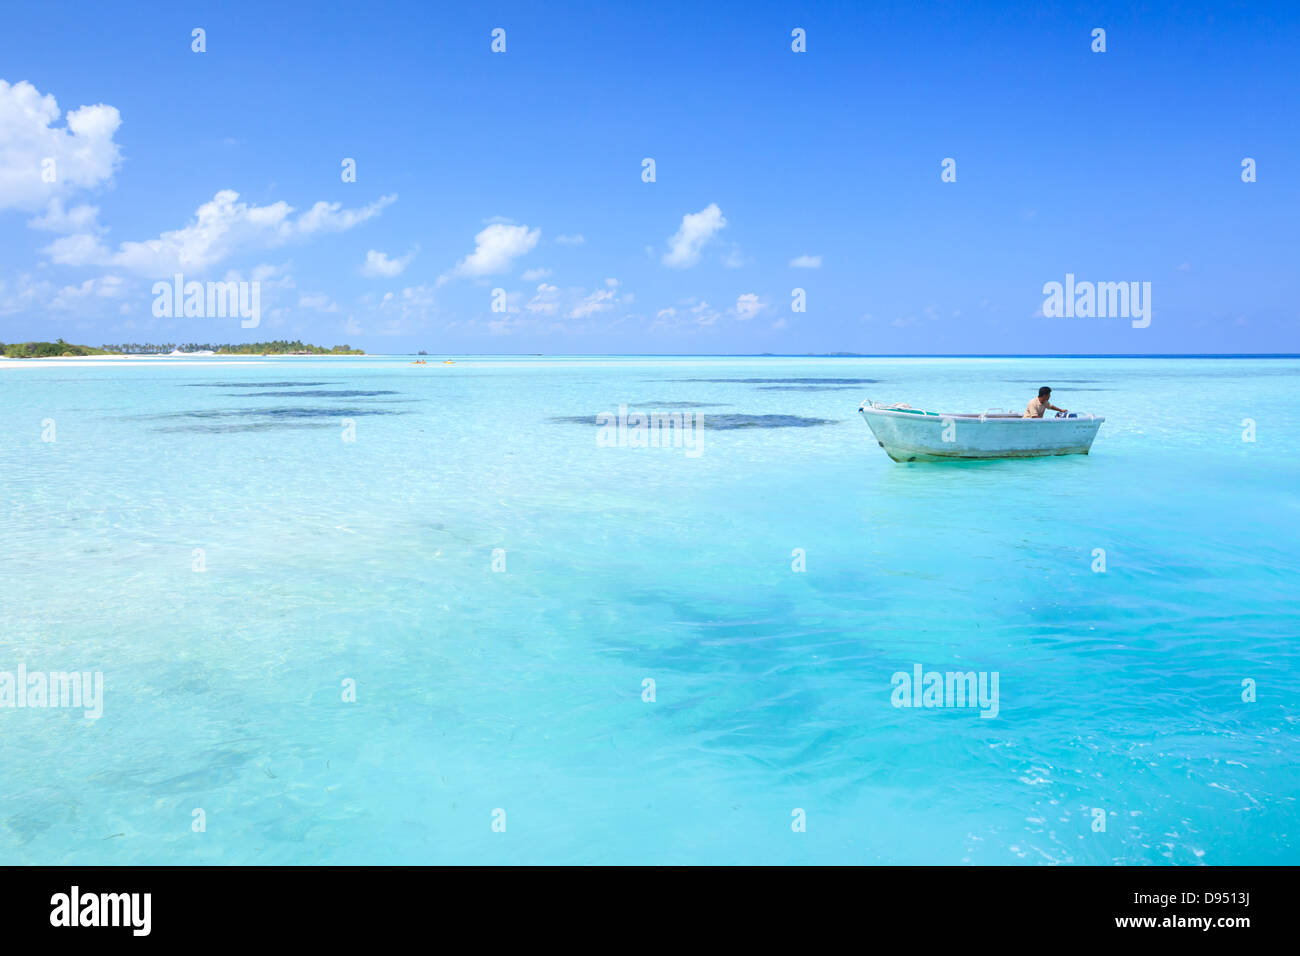 Maldives, Indian ocean - Stock Image